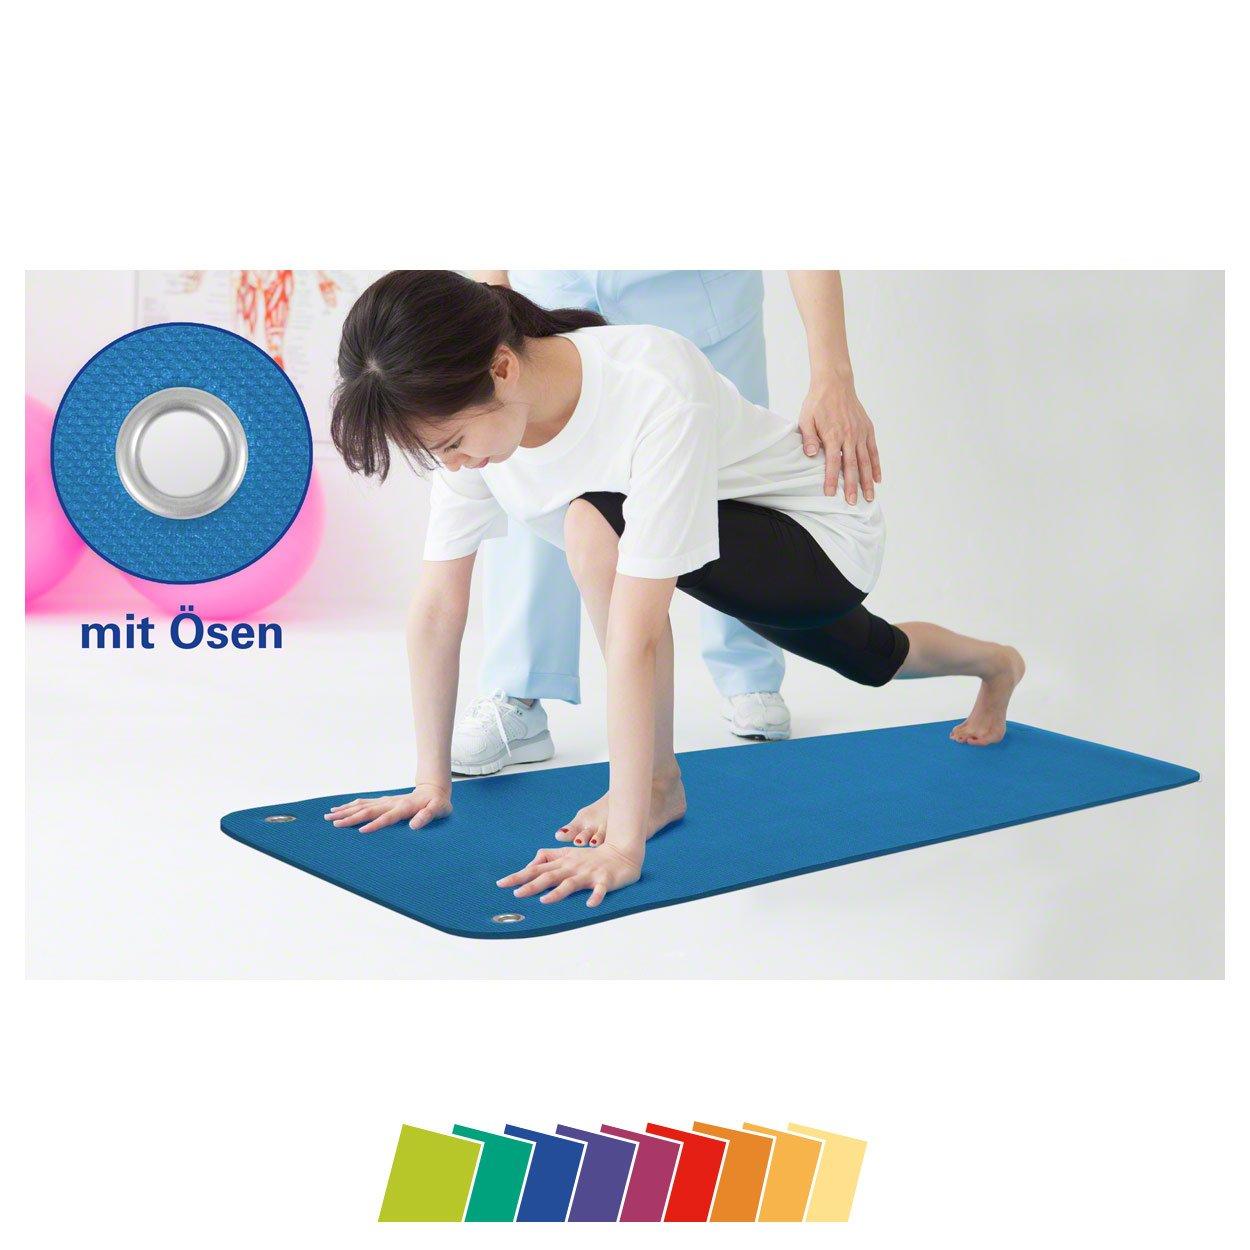 Sport-Tec Therapiematte inkl. Ösen, LxBxH 140x60x1,5 cm